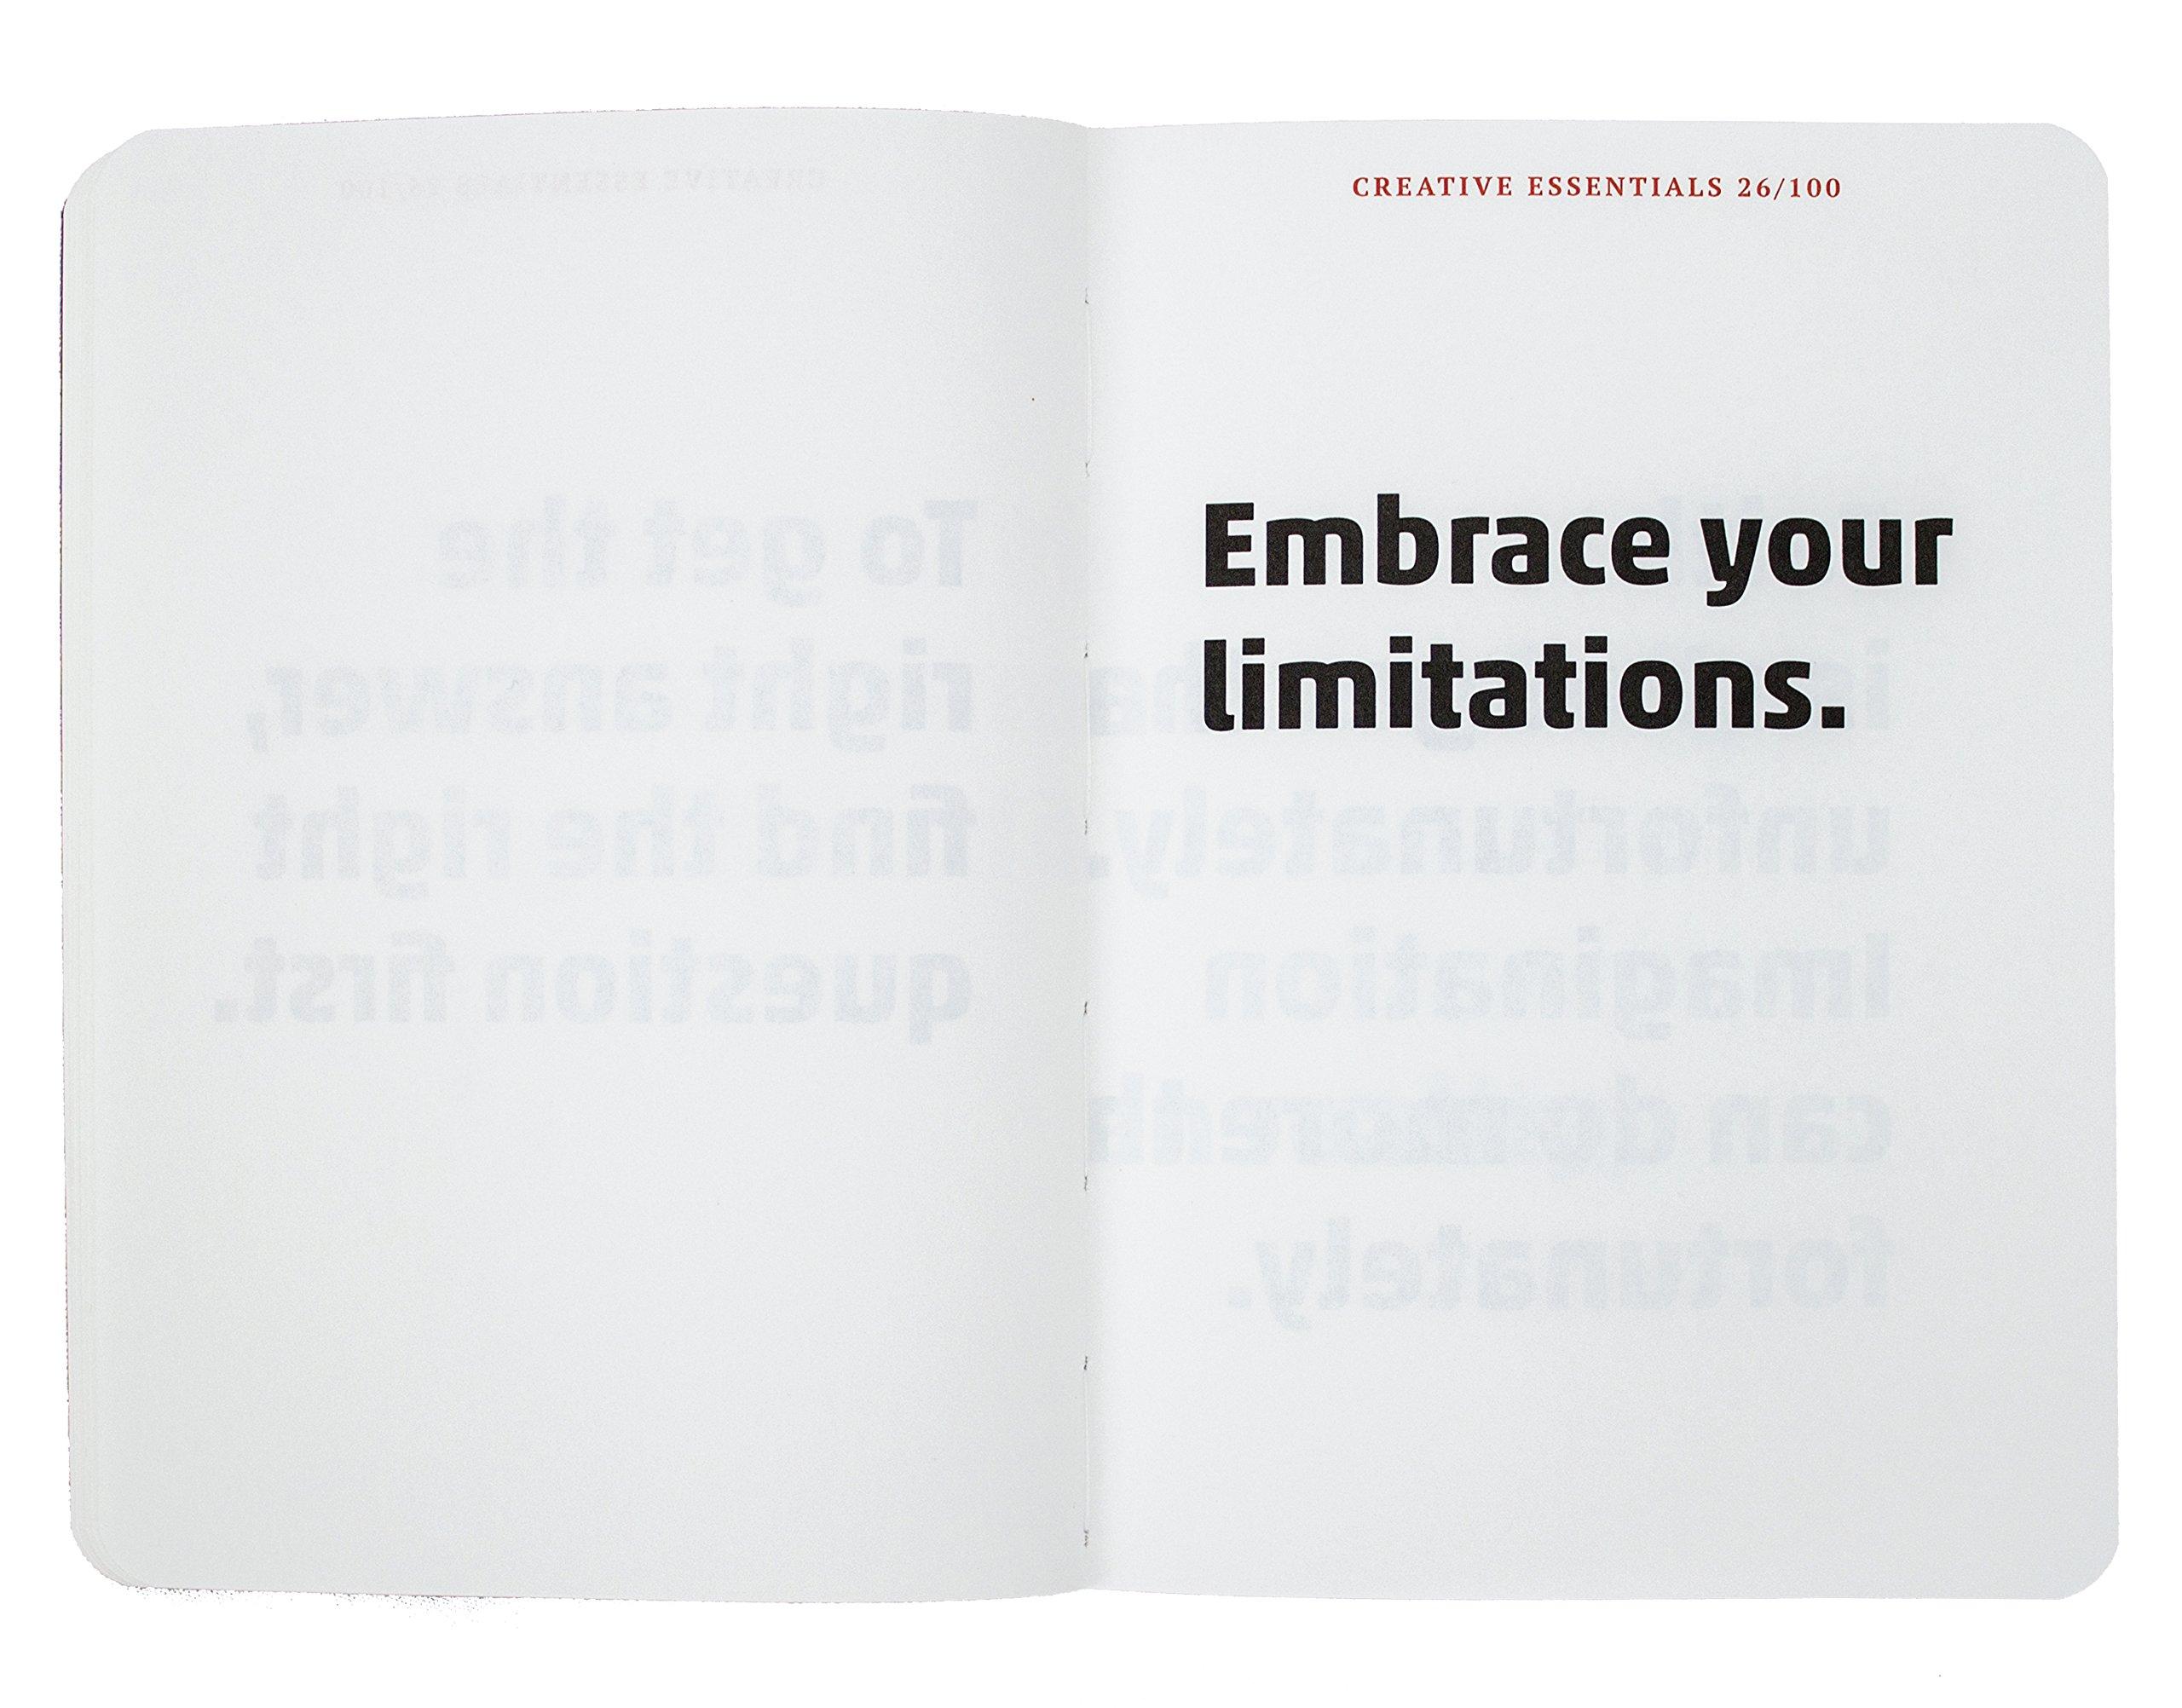 do-it-with-love-creative-quotes-book-moleskine-copywriter-3